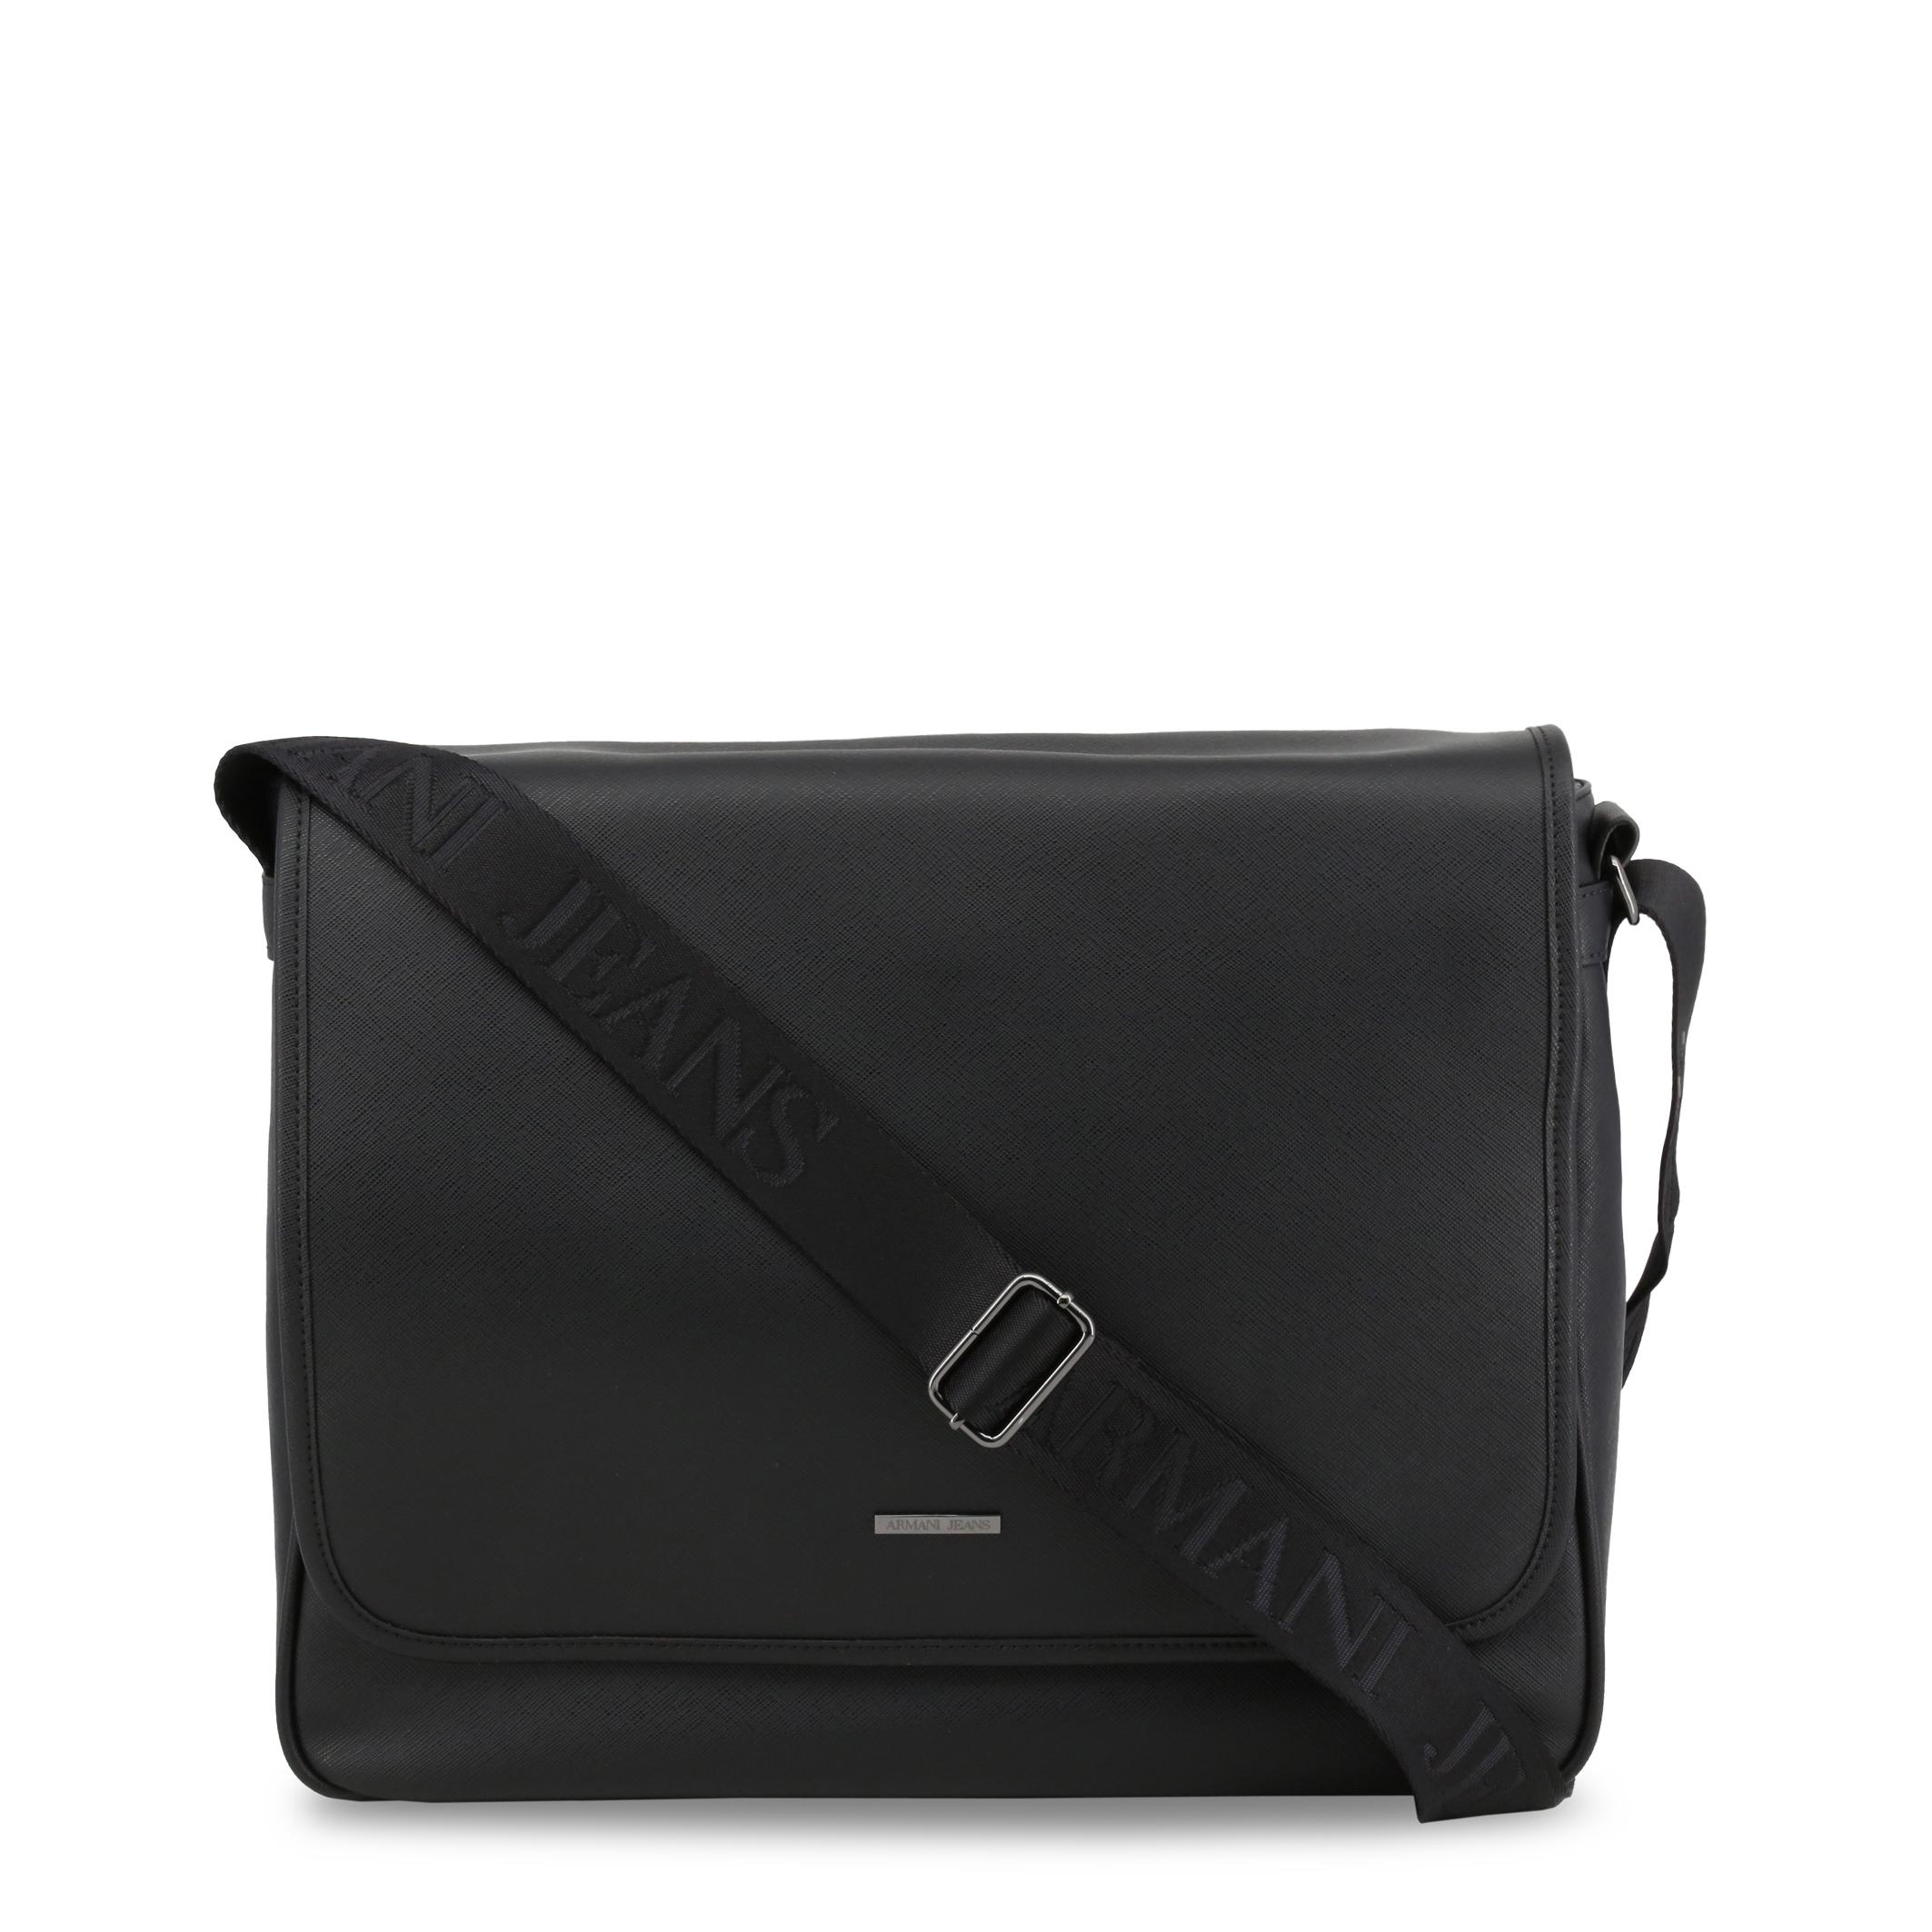 Armani Jeans sac bandoulière 932531_CD991